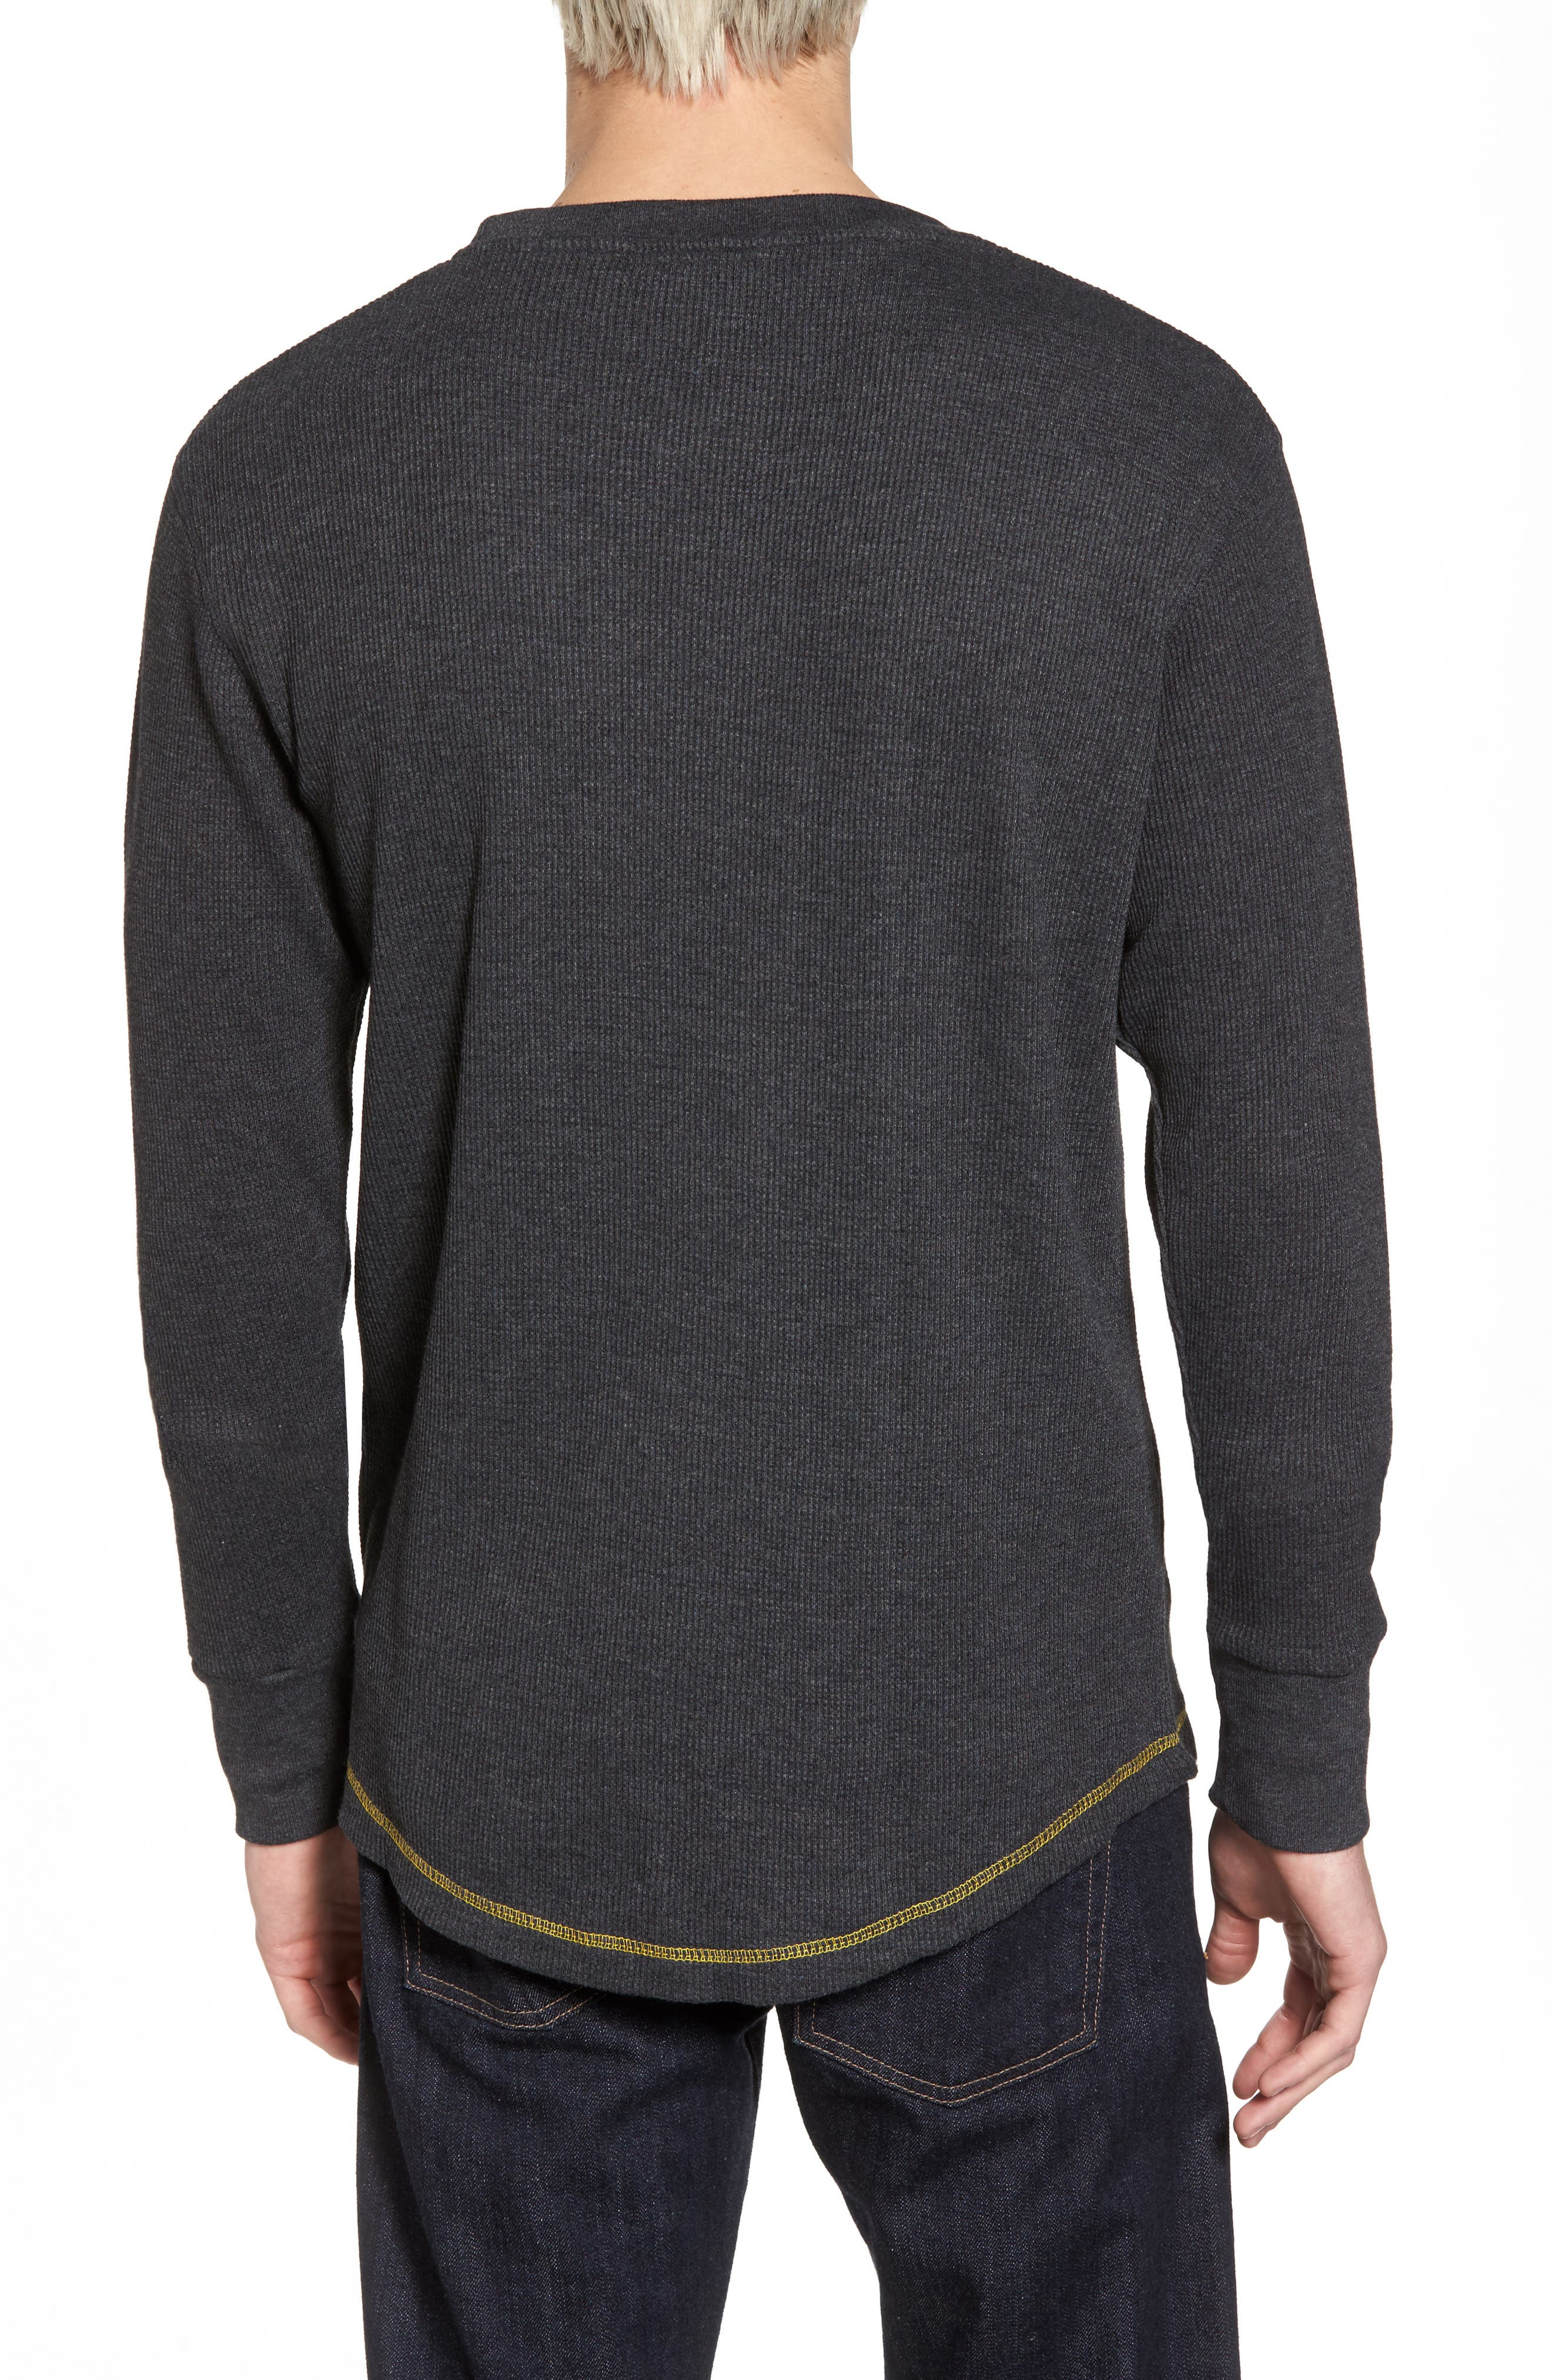 Boston Bruins Embroidered Long Sleeve Thermal Shirt,                             Alternate thumbnail 2, color,                             Black